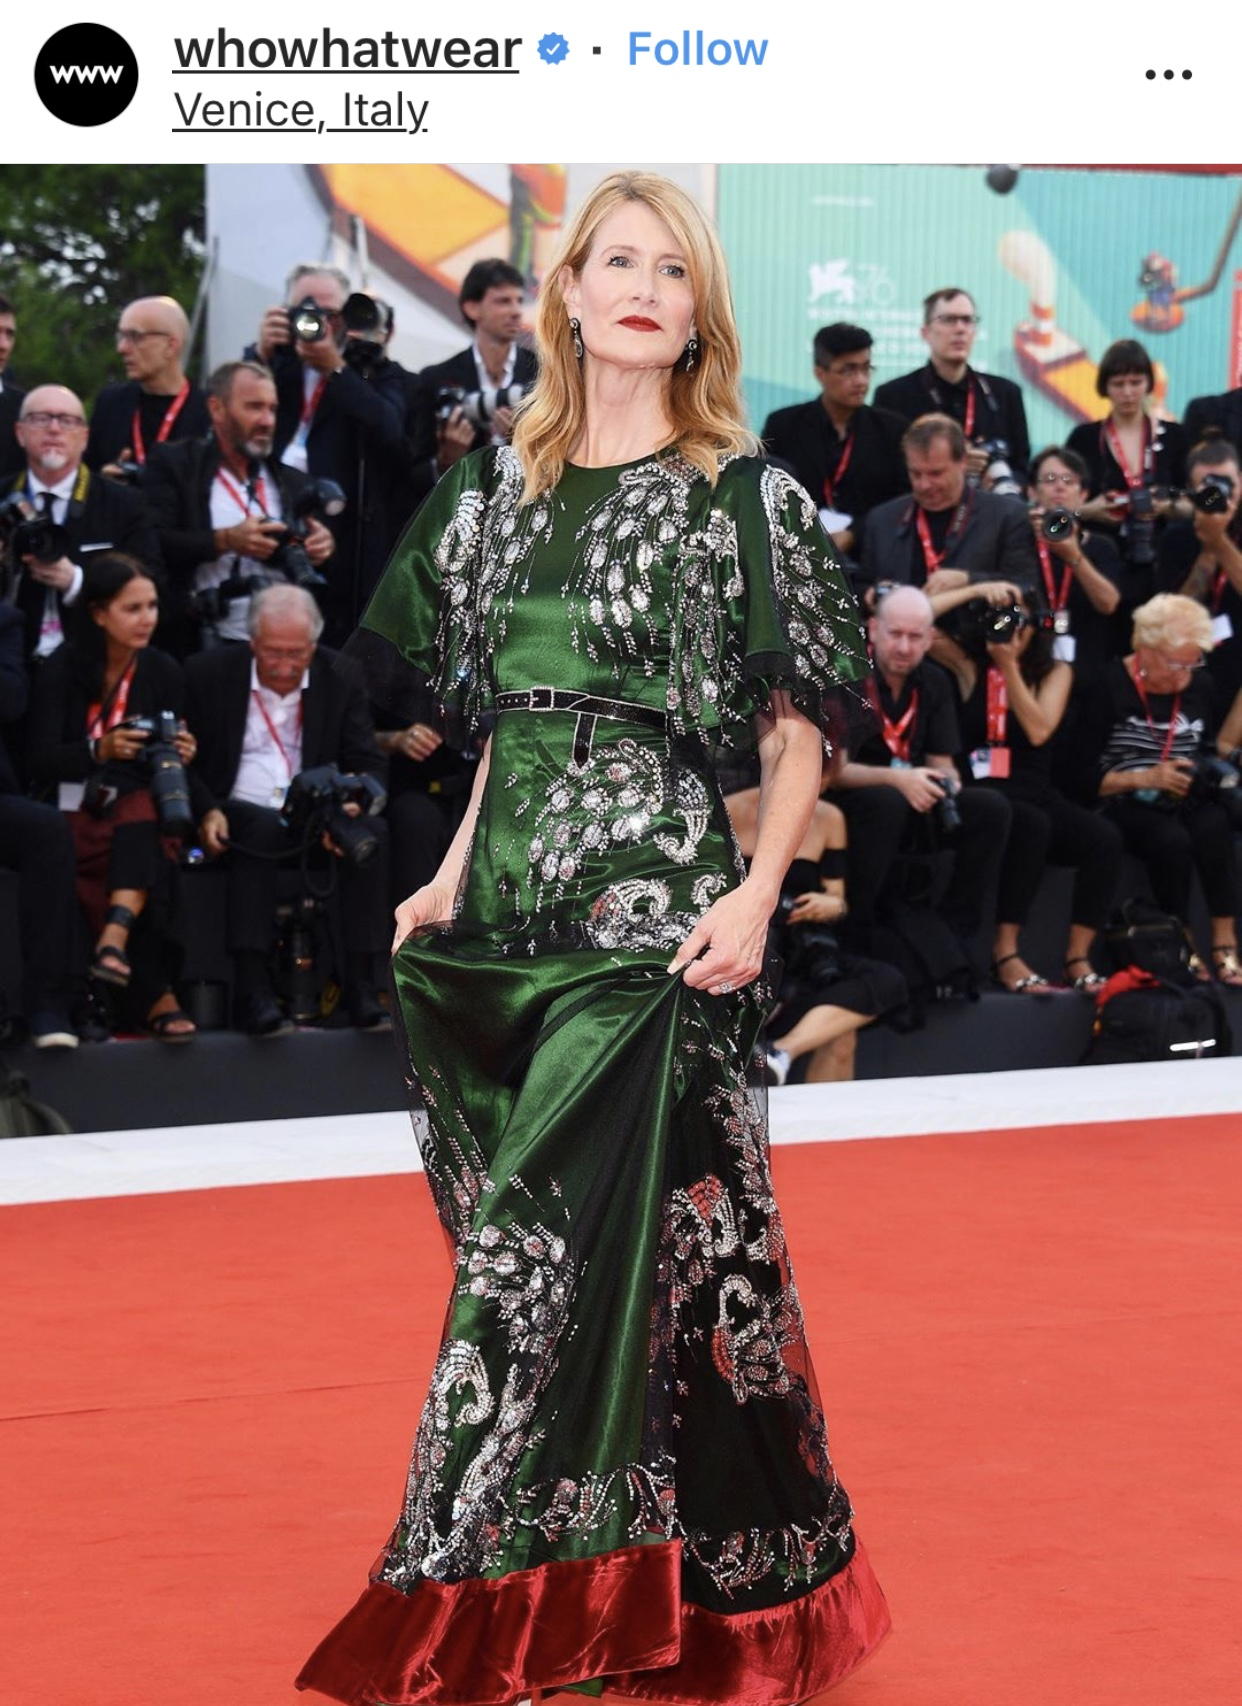 Laura-Dern-in-Gucci-vencie-film-festival.jpg